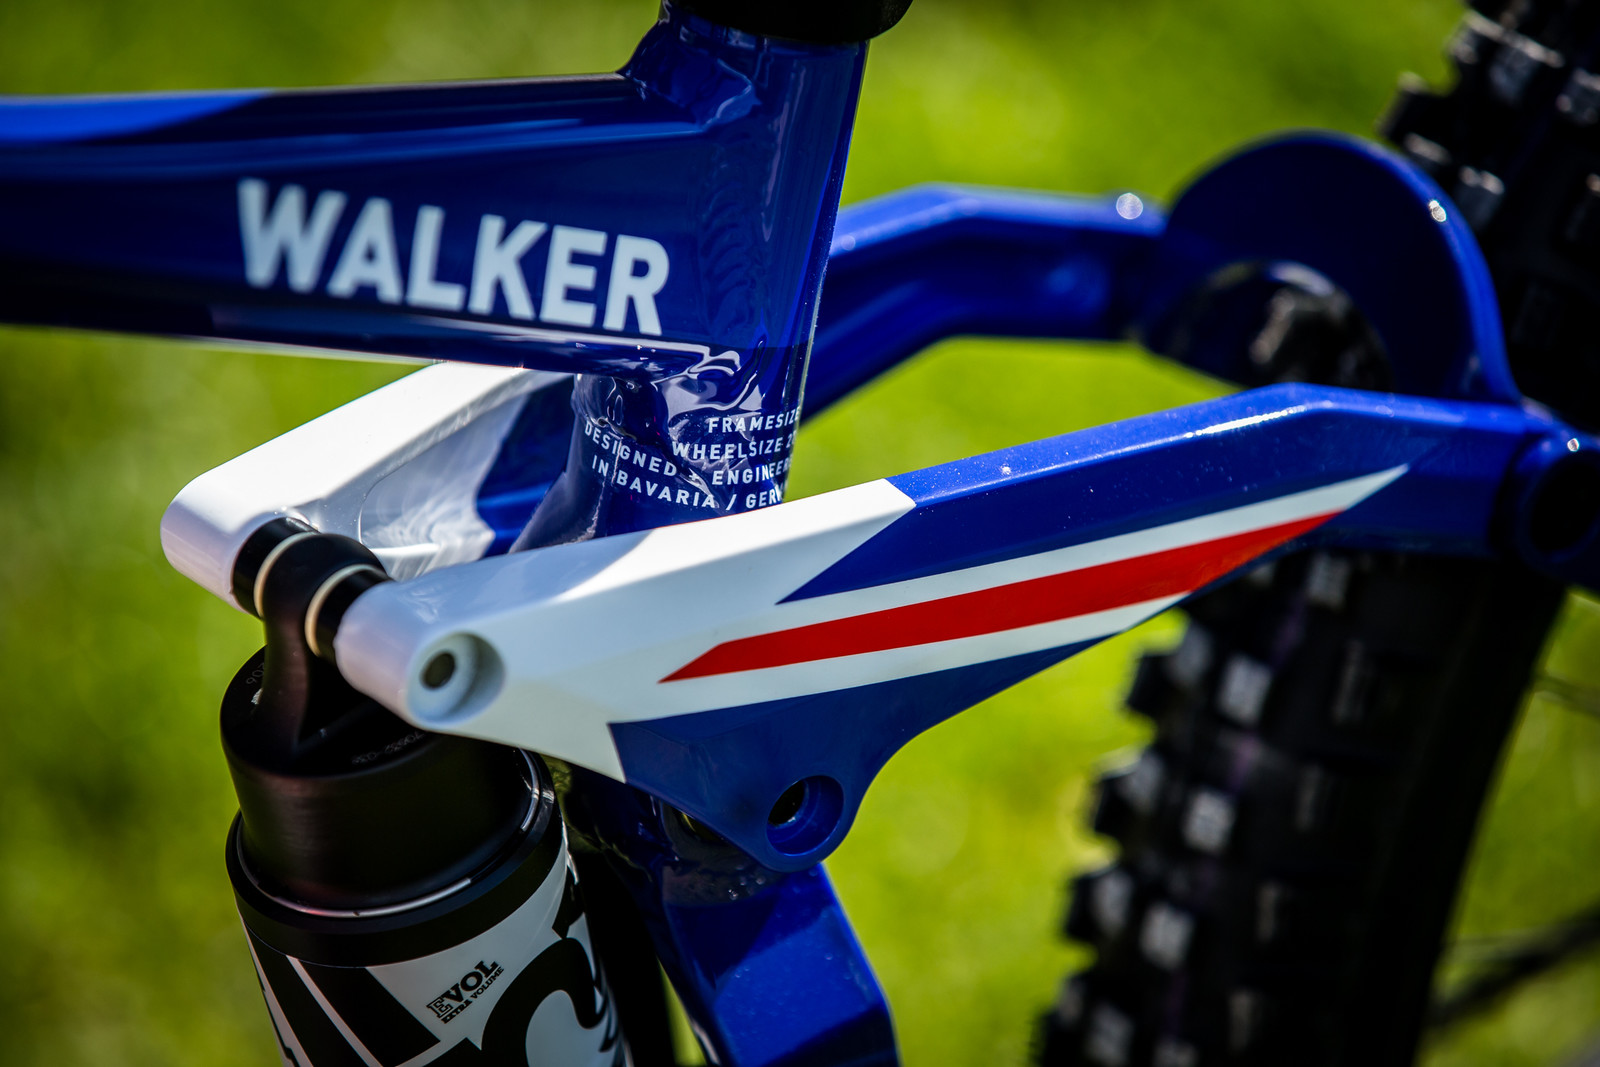 More Like Sprinter - WORLD CHAMPS BIKES - Matt Walker and Max Hartenstern's Cubes - Mountain Biking Pictures - Vital MTB